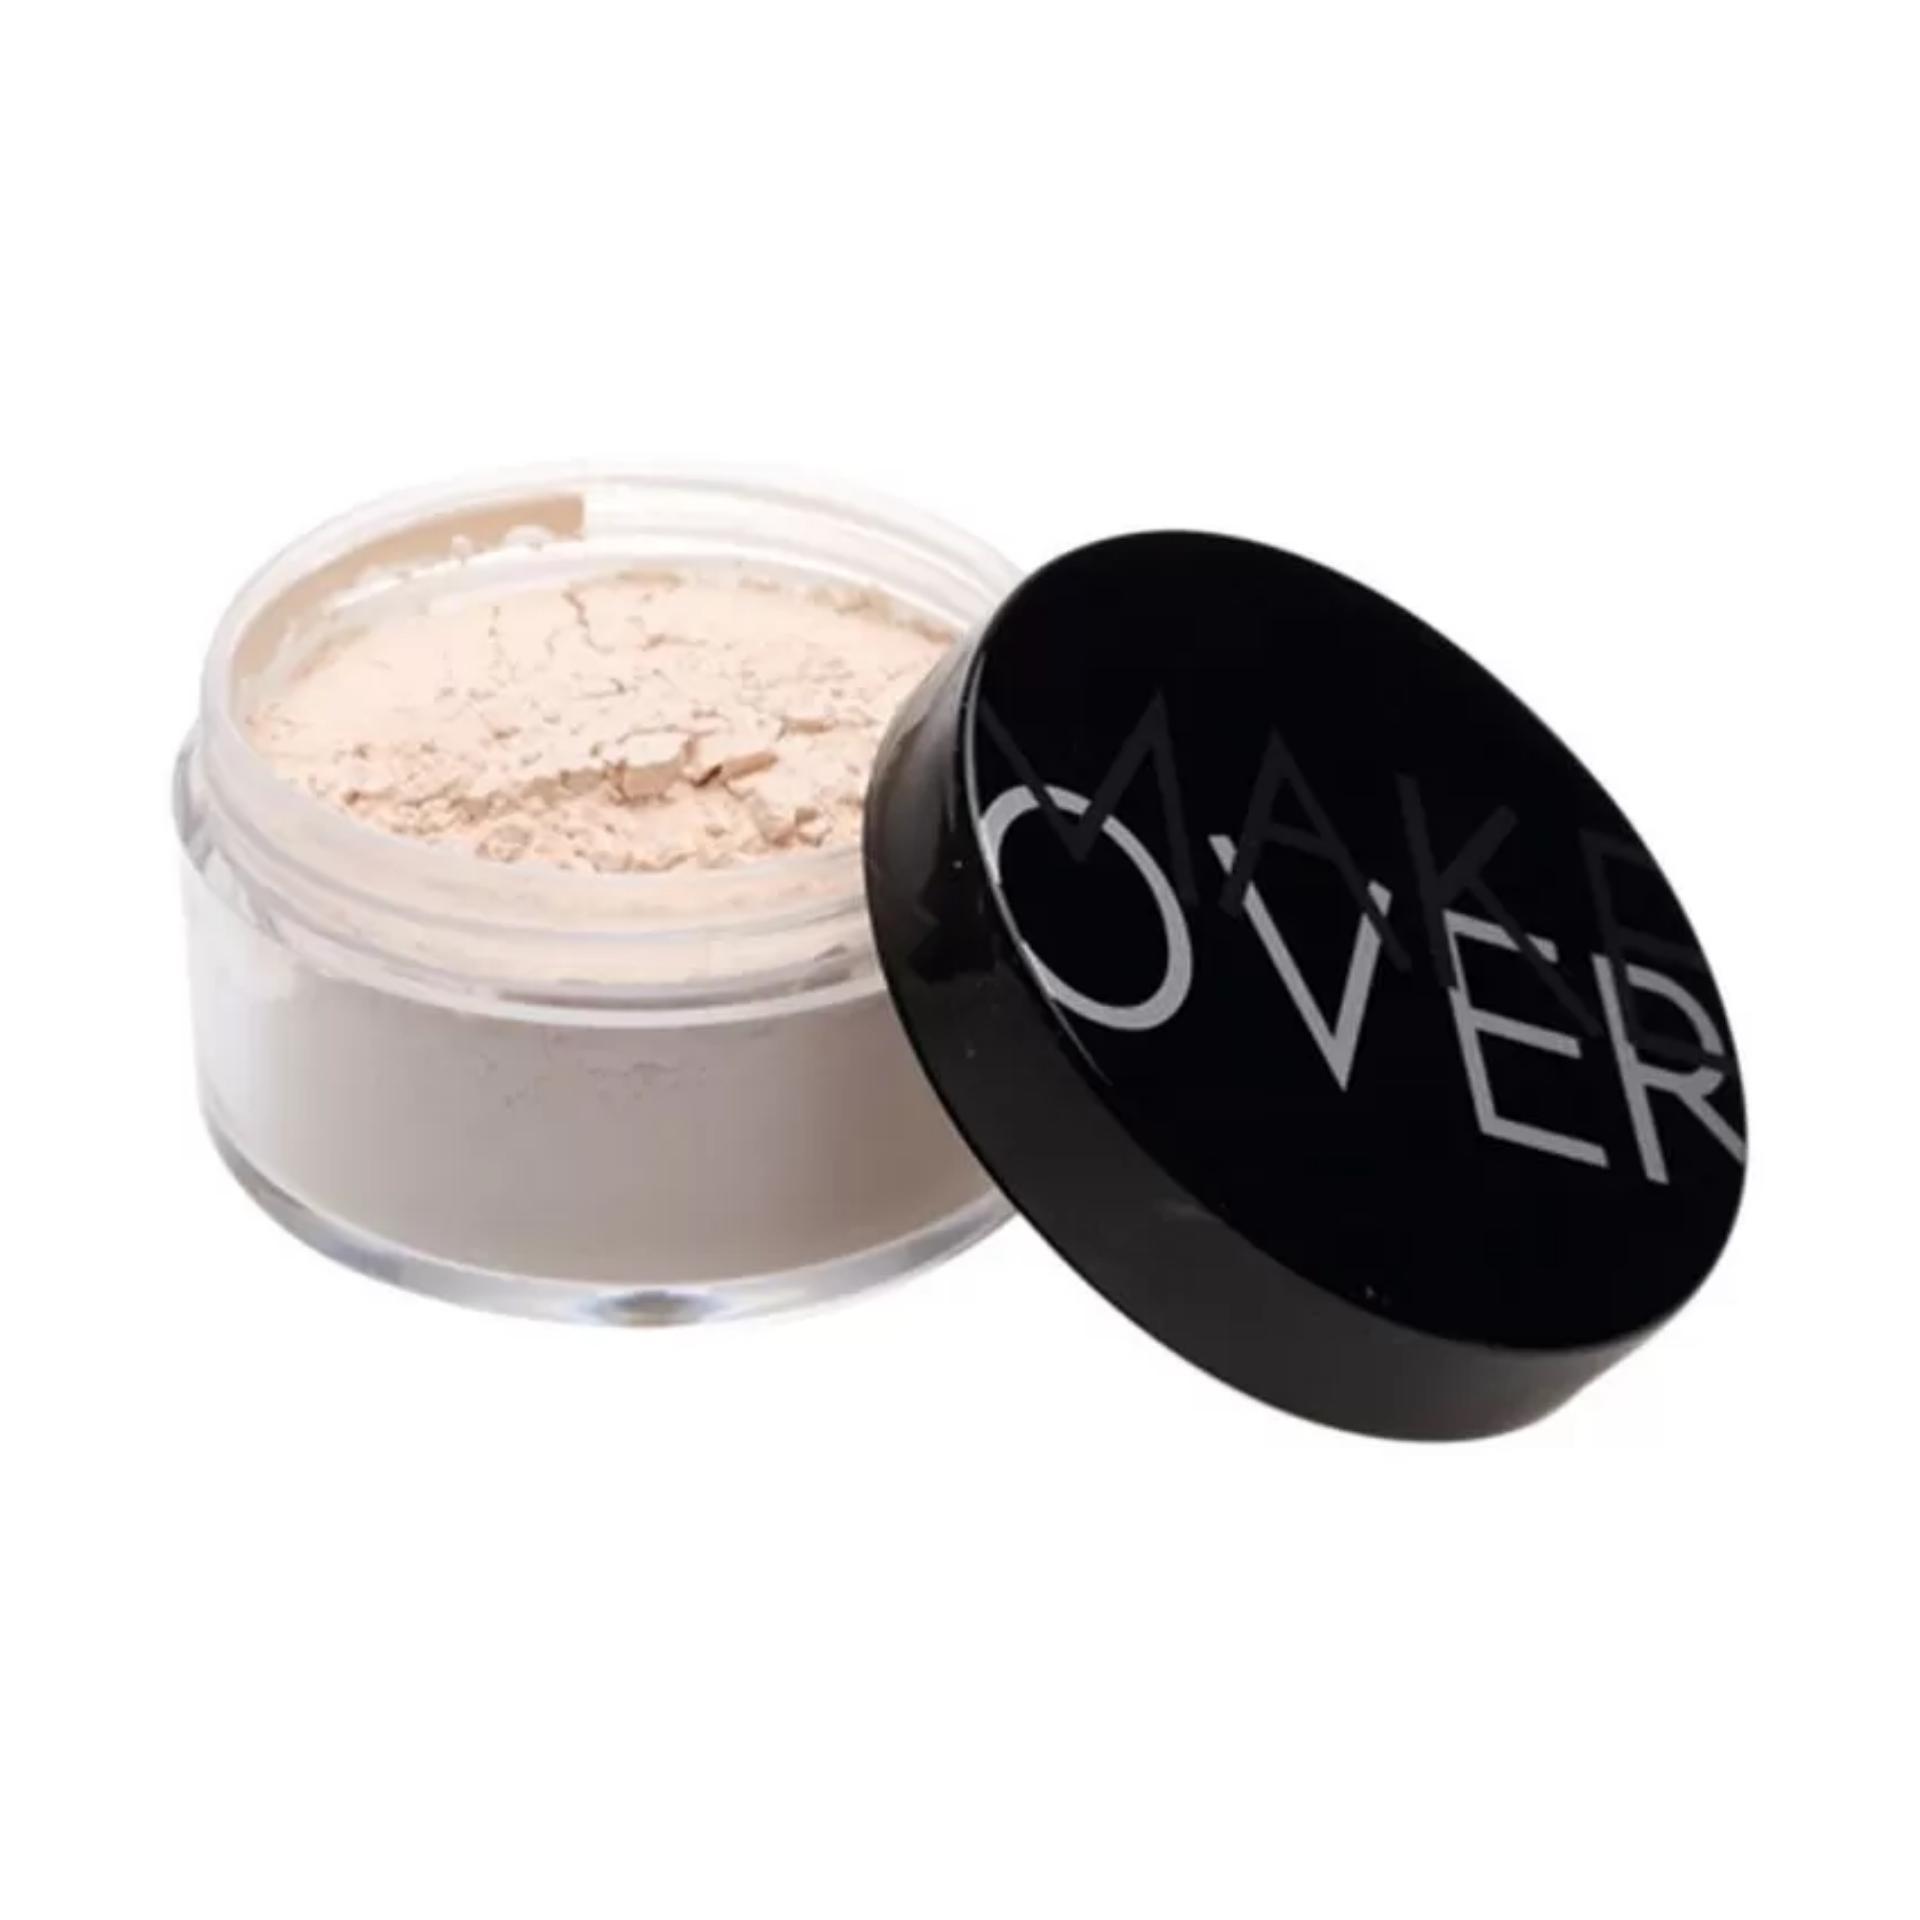 Skinfood Peach Sake Silky Finish Powder Face Loose Bedak Skod Cotton Multi 5gram Tabur Make Over